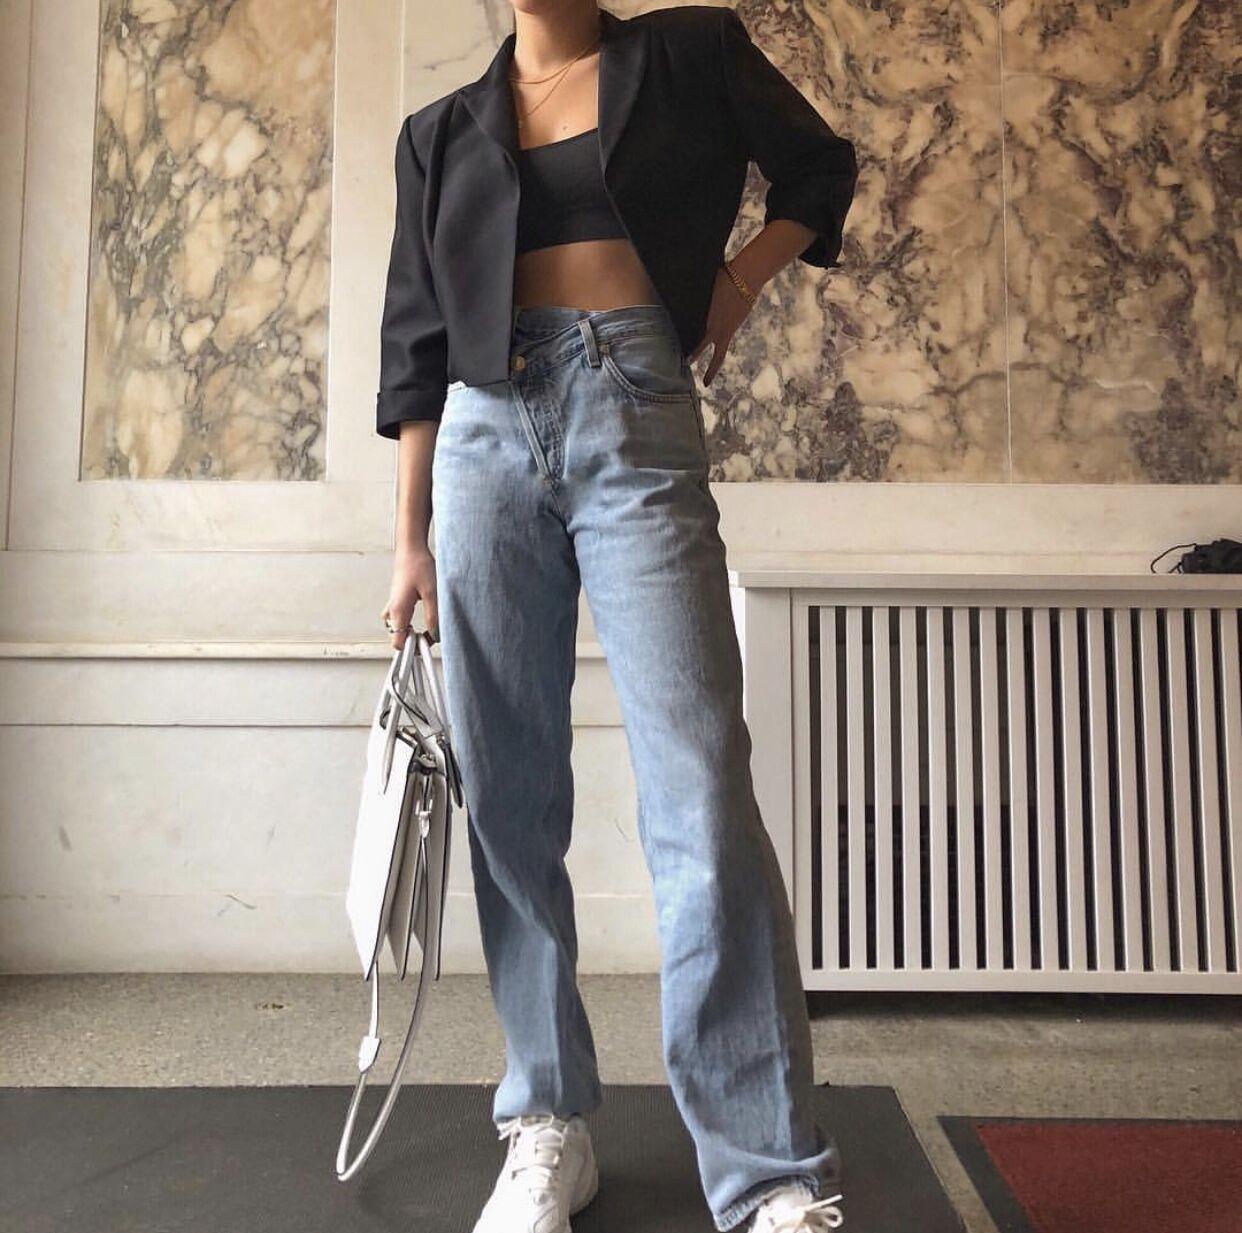 2020 High Waist Jeans Woman Casual Loose Women Denim Pants Straight Cotton Vintage Boyfriend Jeans Chic Long Trousers Streetwear 4